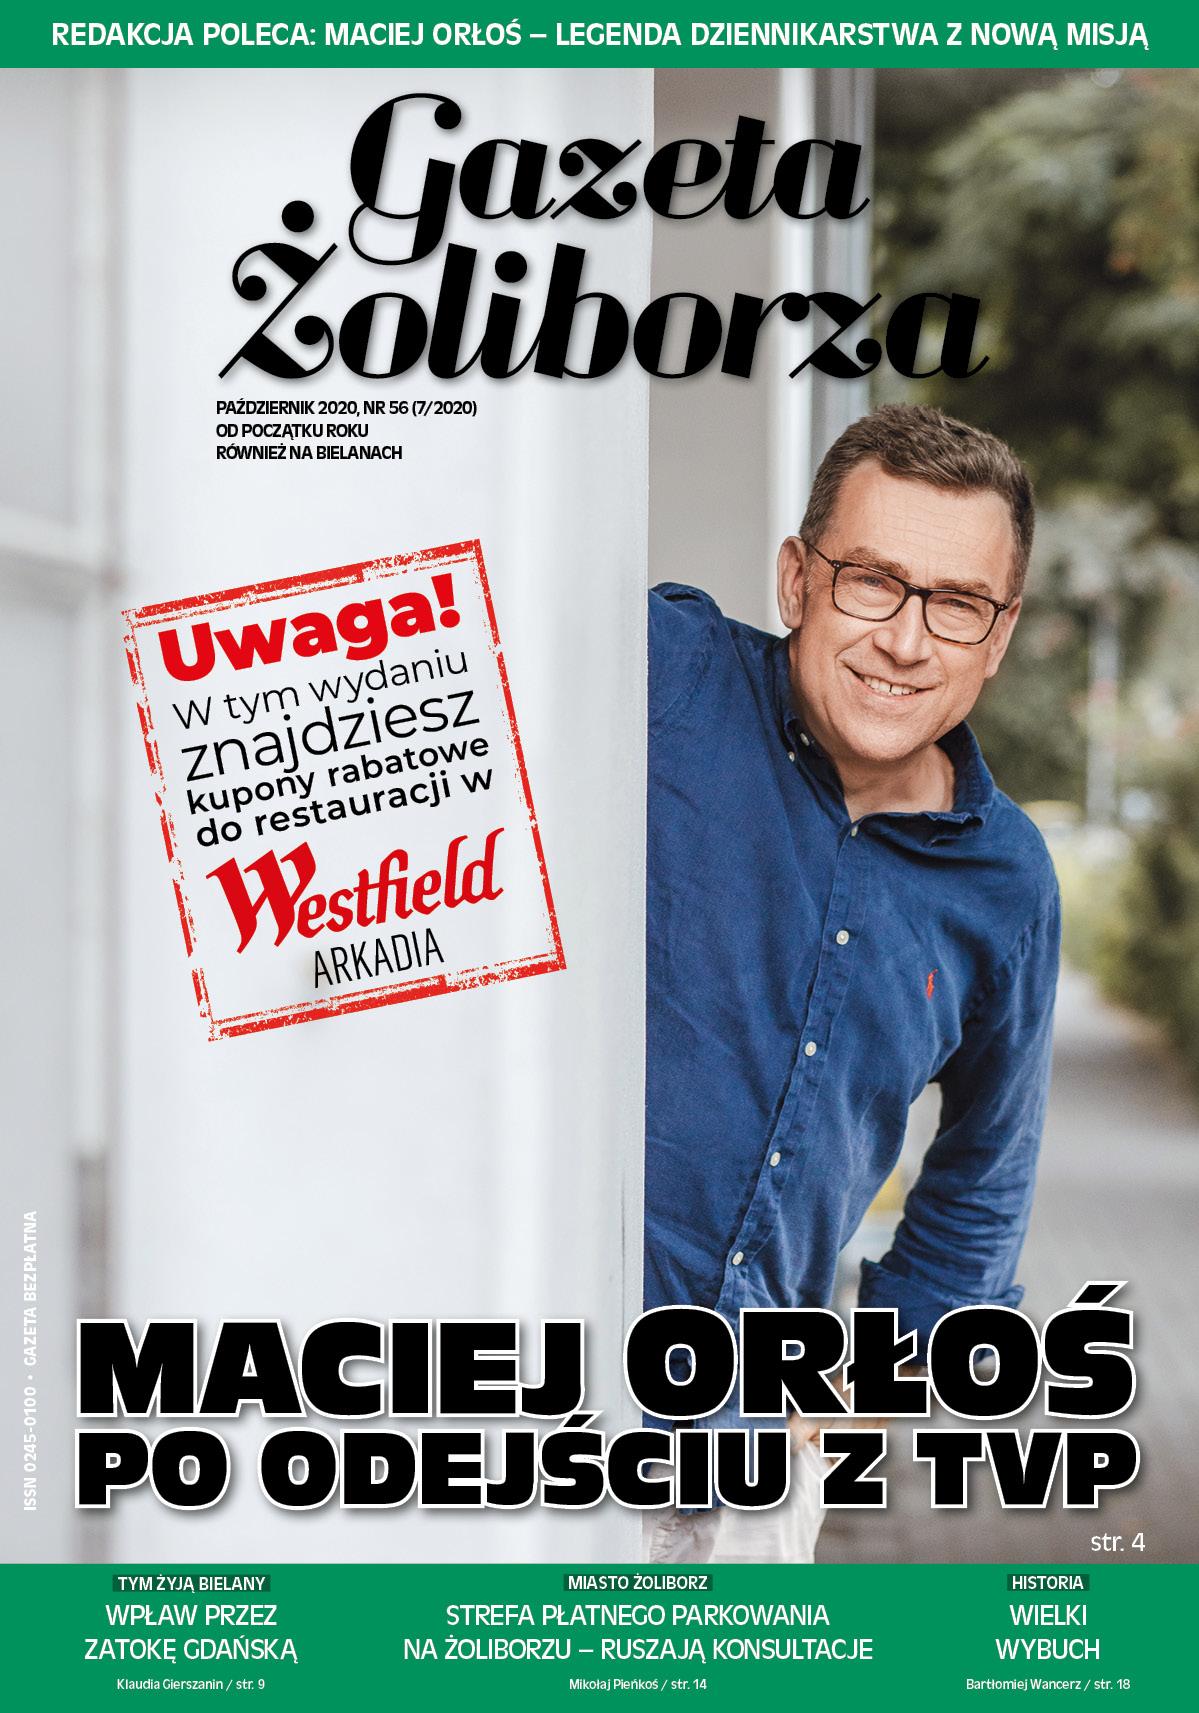 Gazeta Żoliborza - 10/2020 (56)